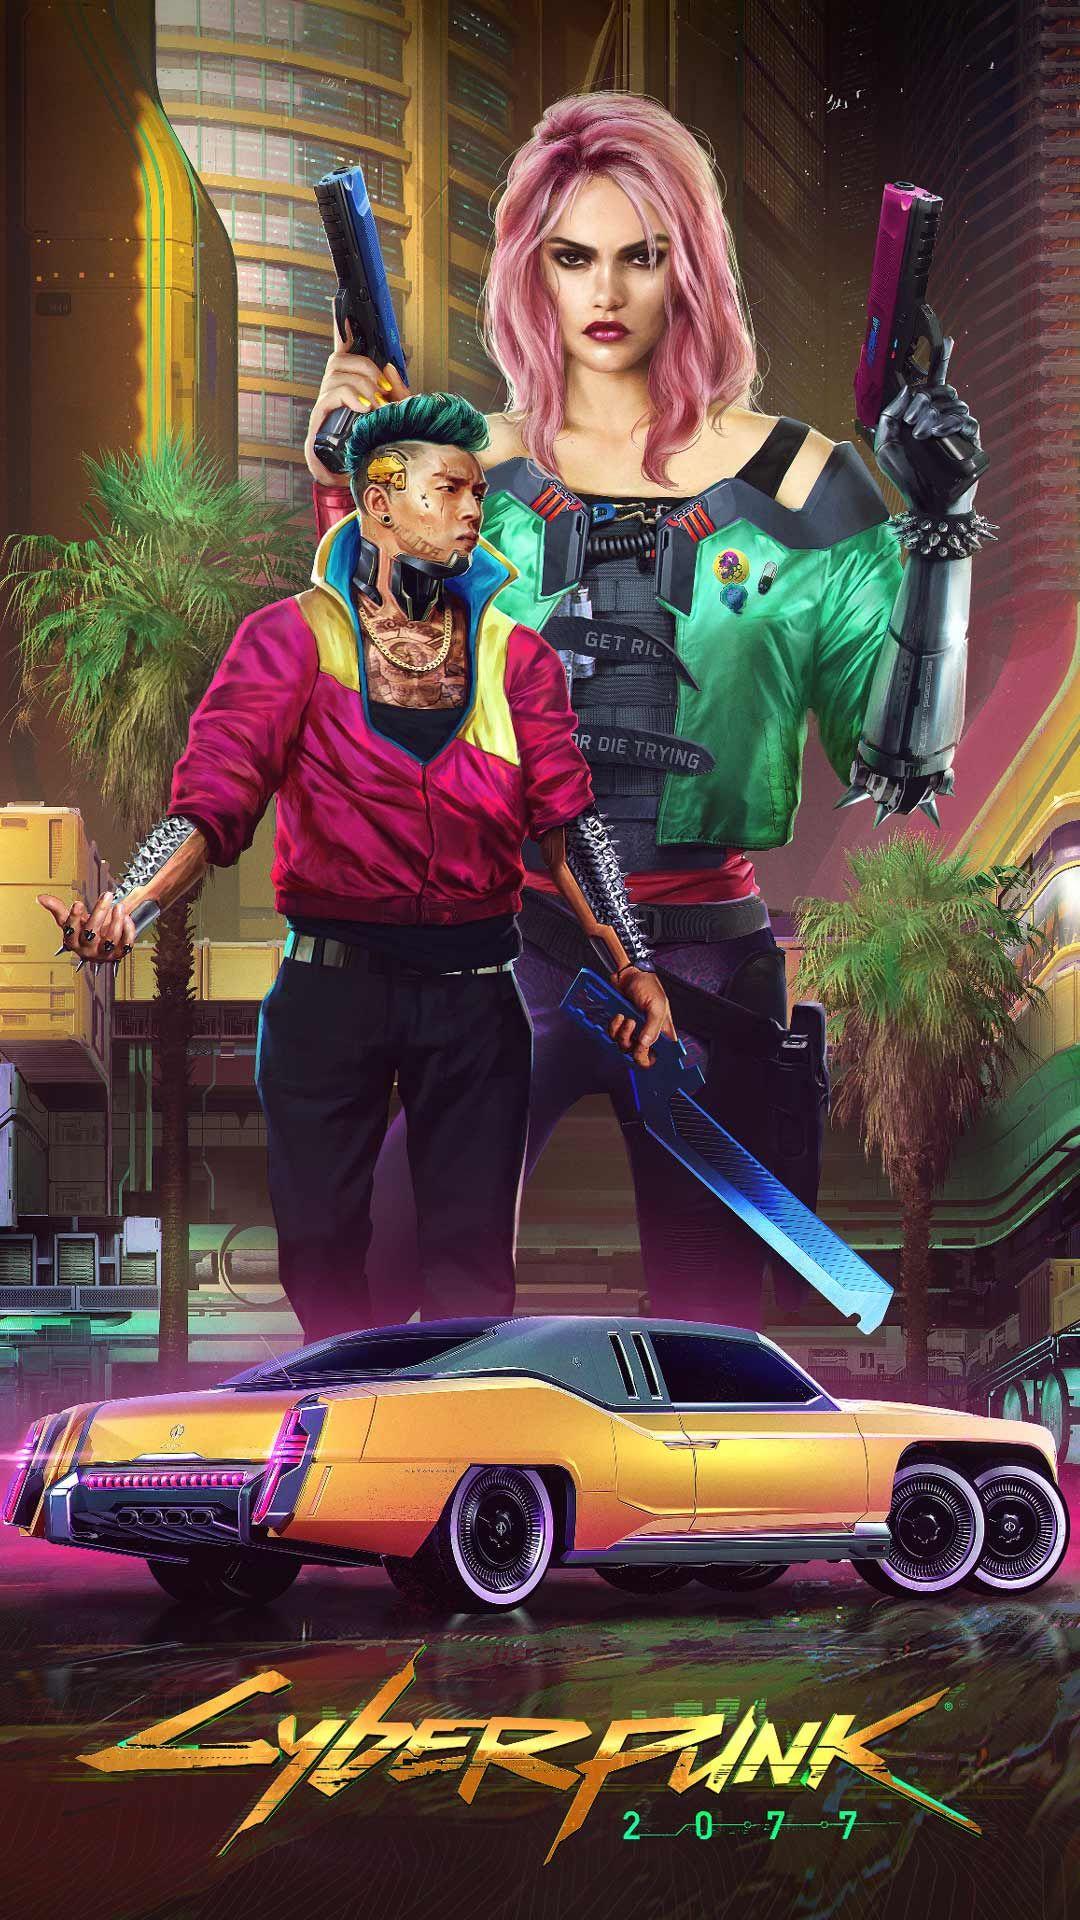 Cyberpunk 2077 wallpaper HD phone backgrounds Night city